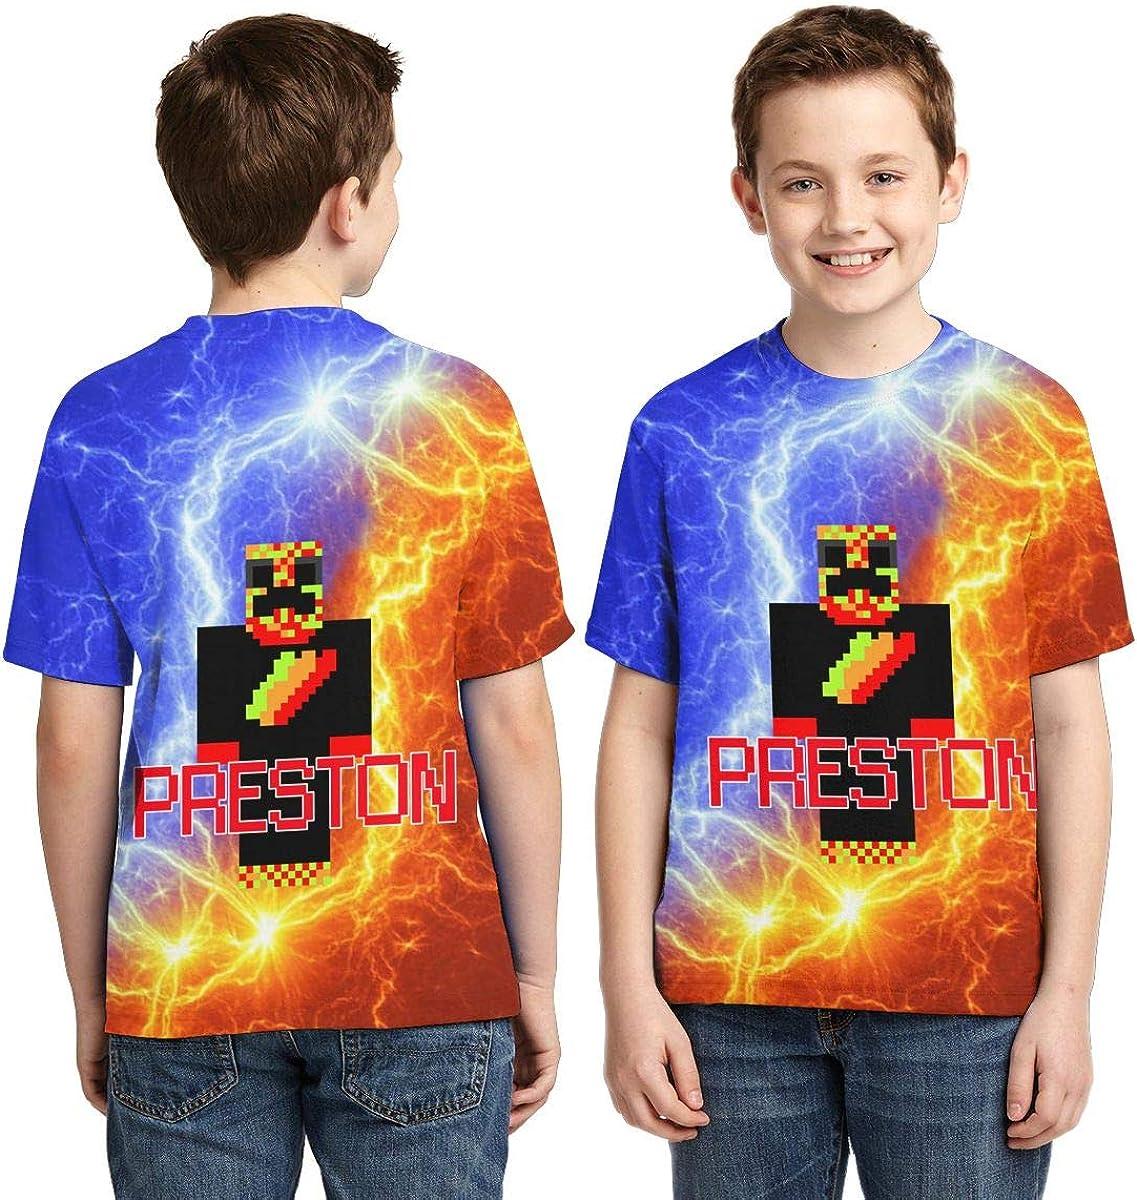 POLK HZT Preston Playz Shirt Boys Girl Novelty Gift 3D Print Short Sleeve T-Shirt